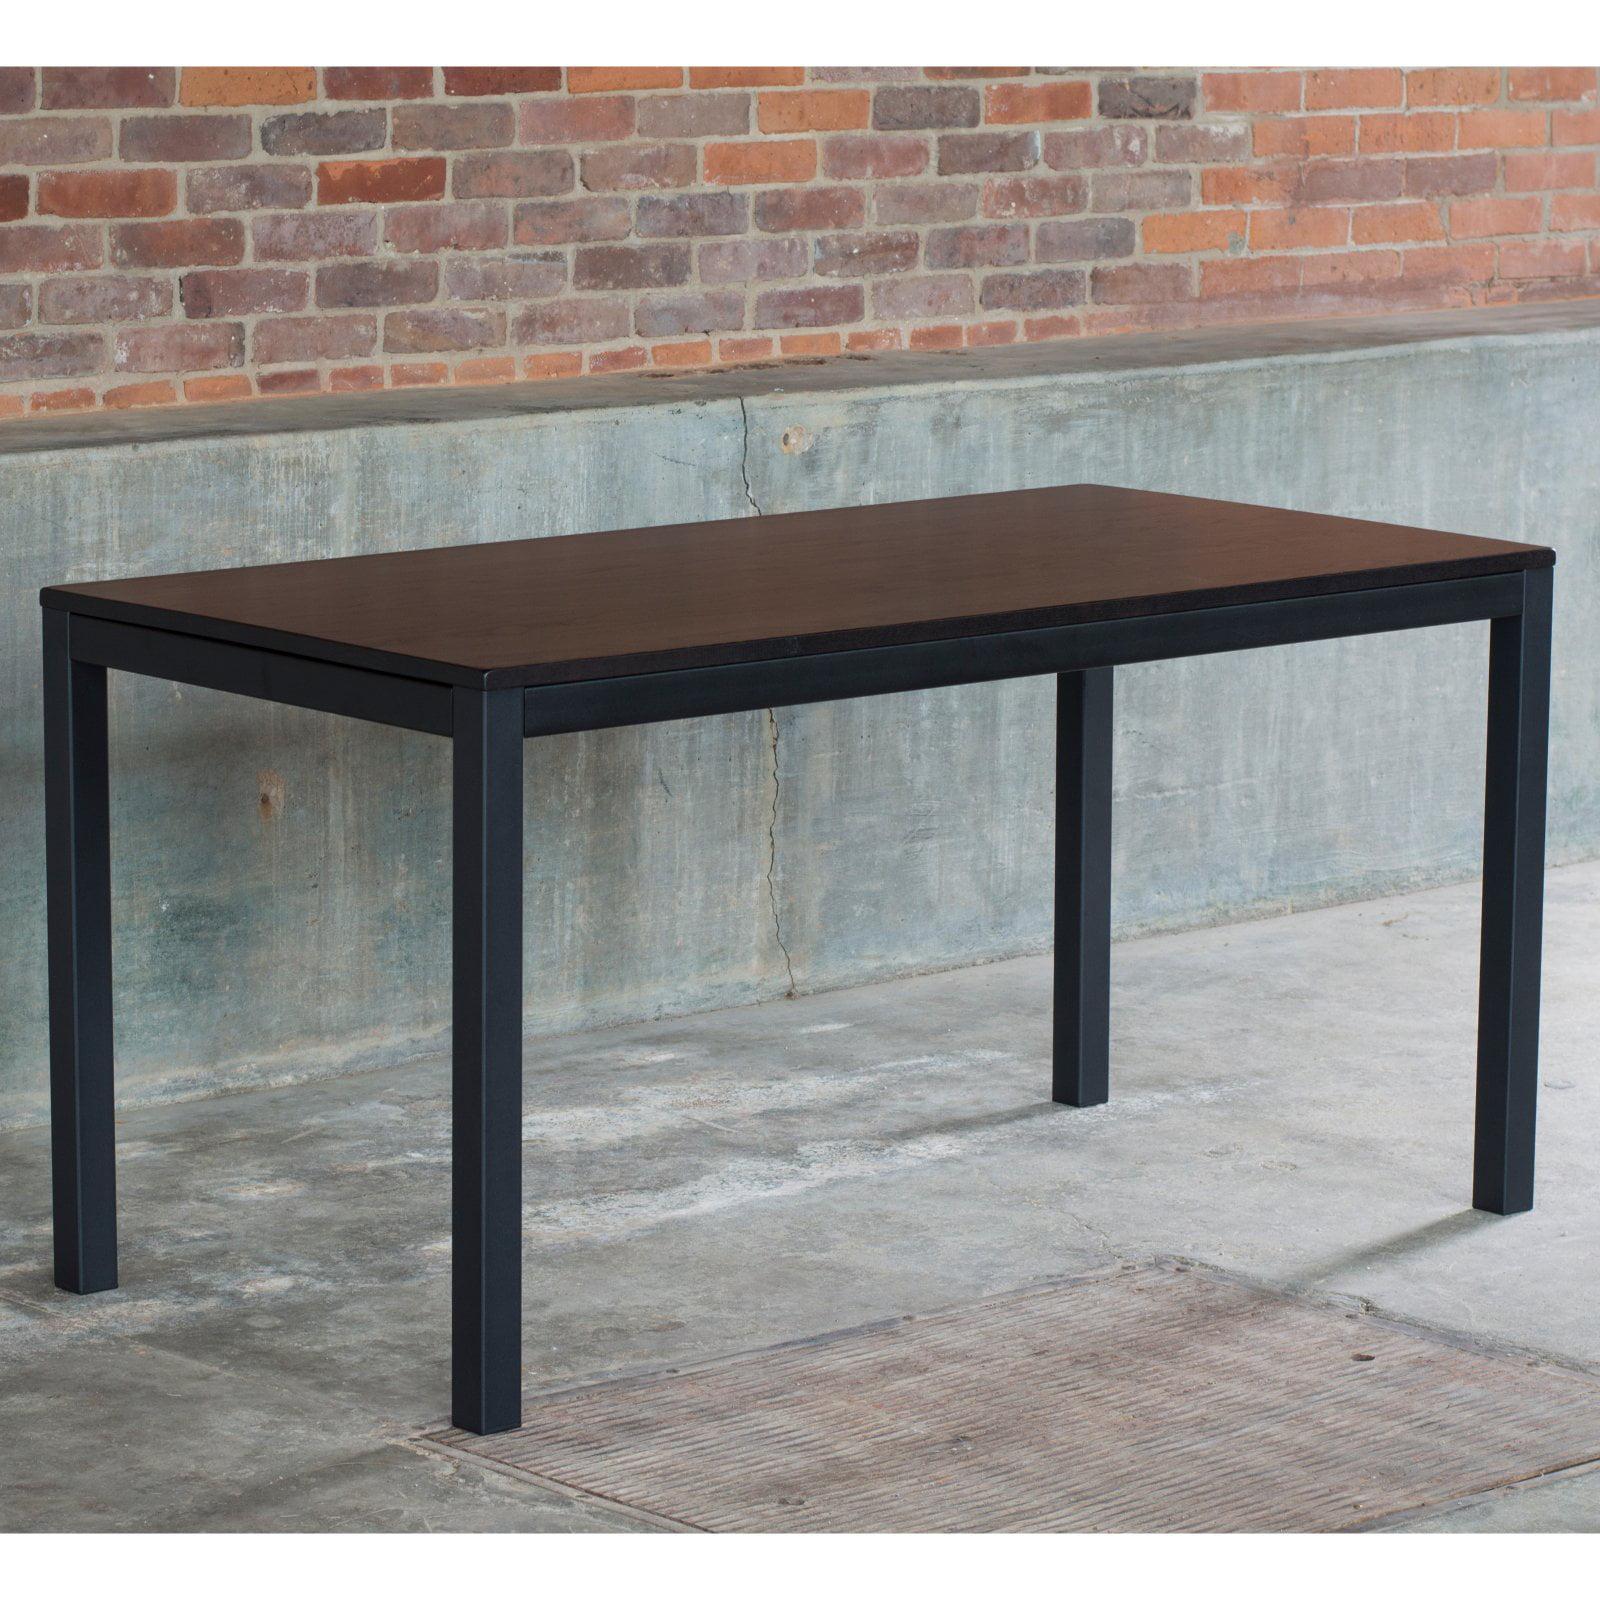 Elan Furniture Loft Dining Table - Onyx